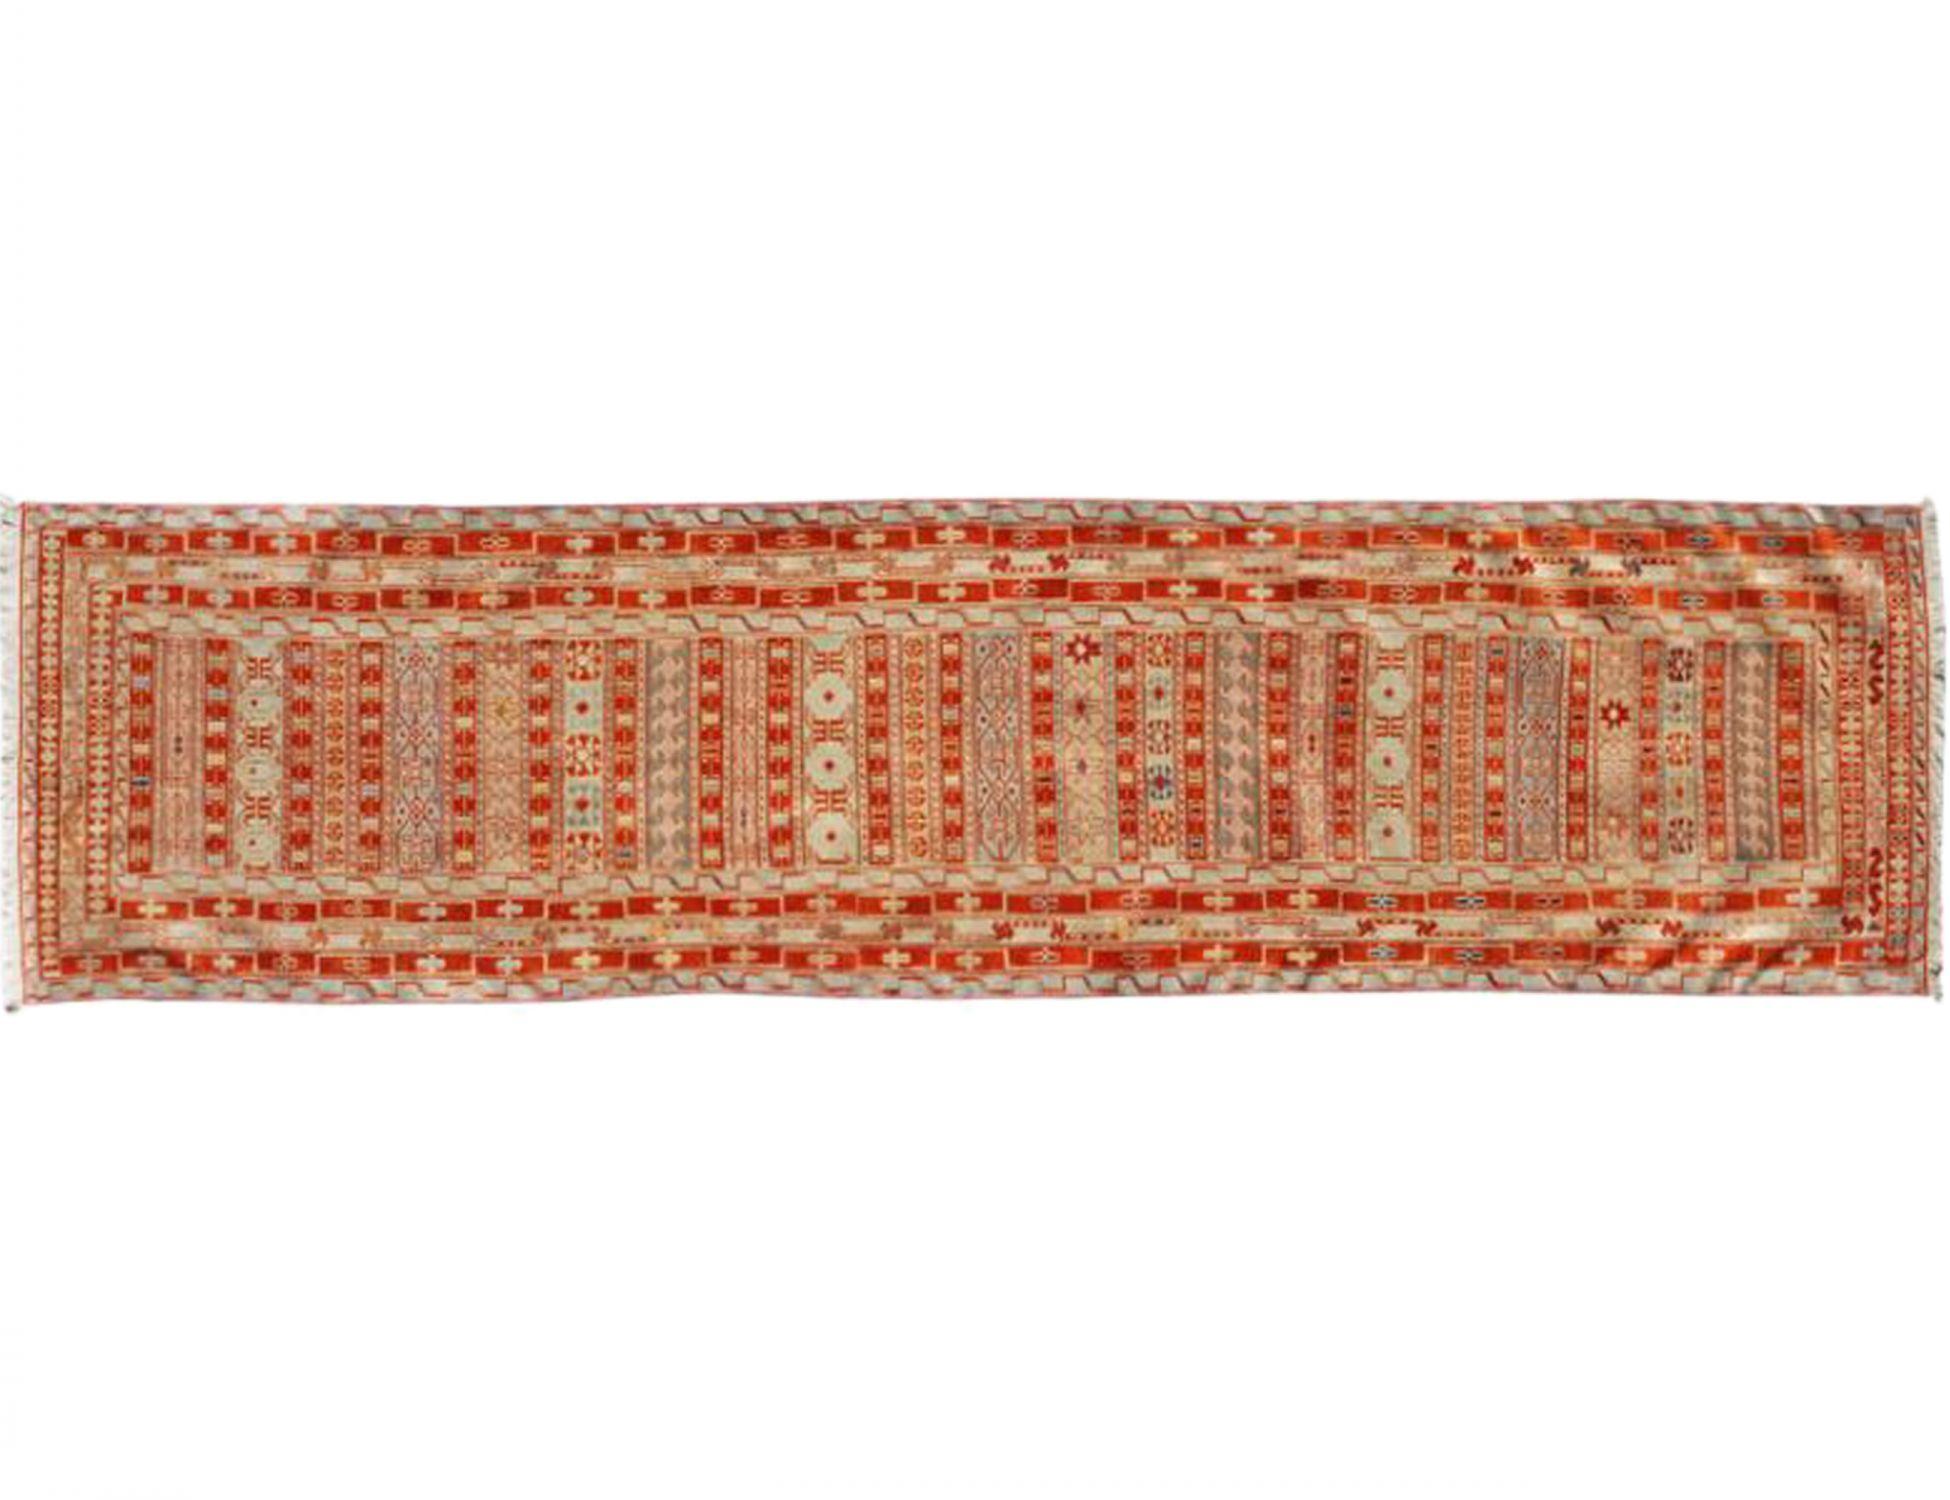 PERSIAN SILK KILIMS   <br/>283 x 74 cm